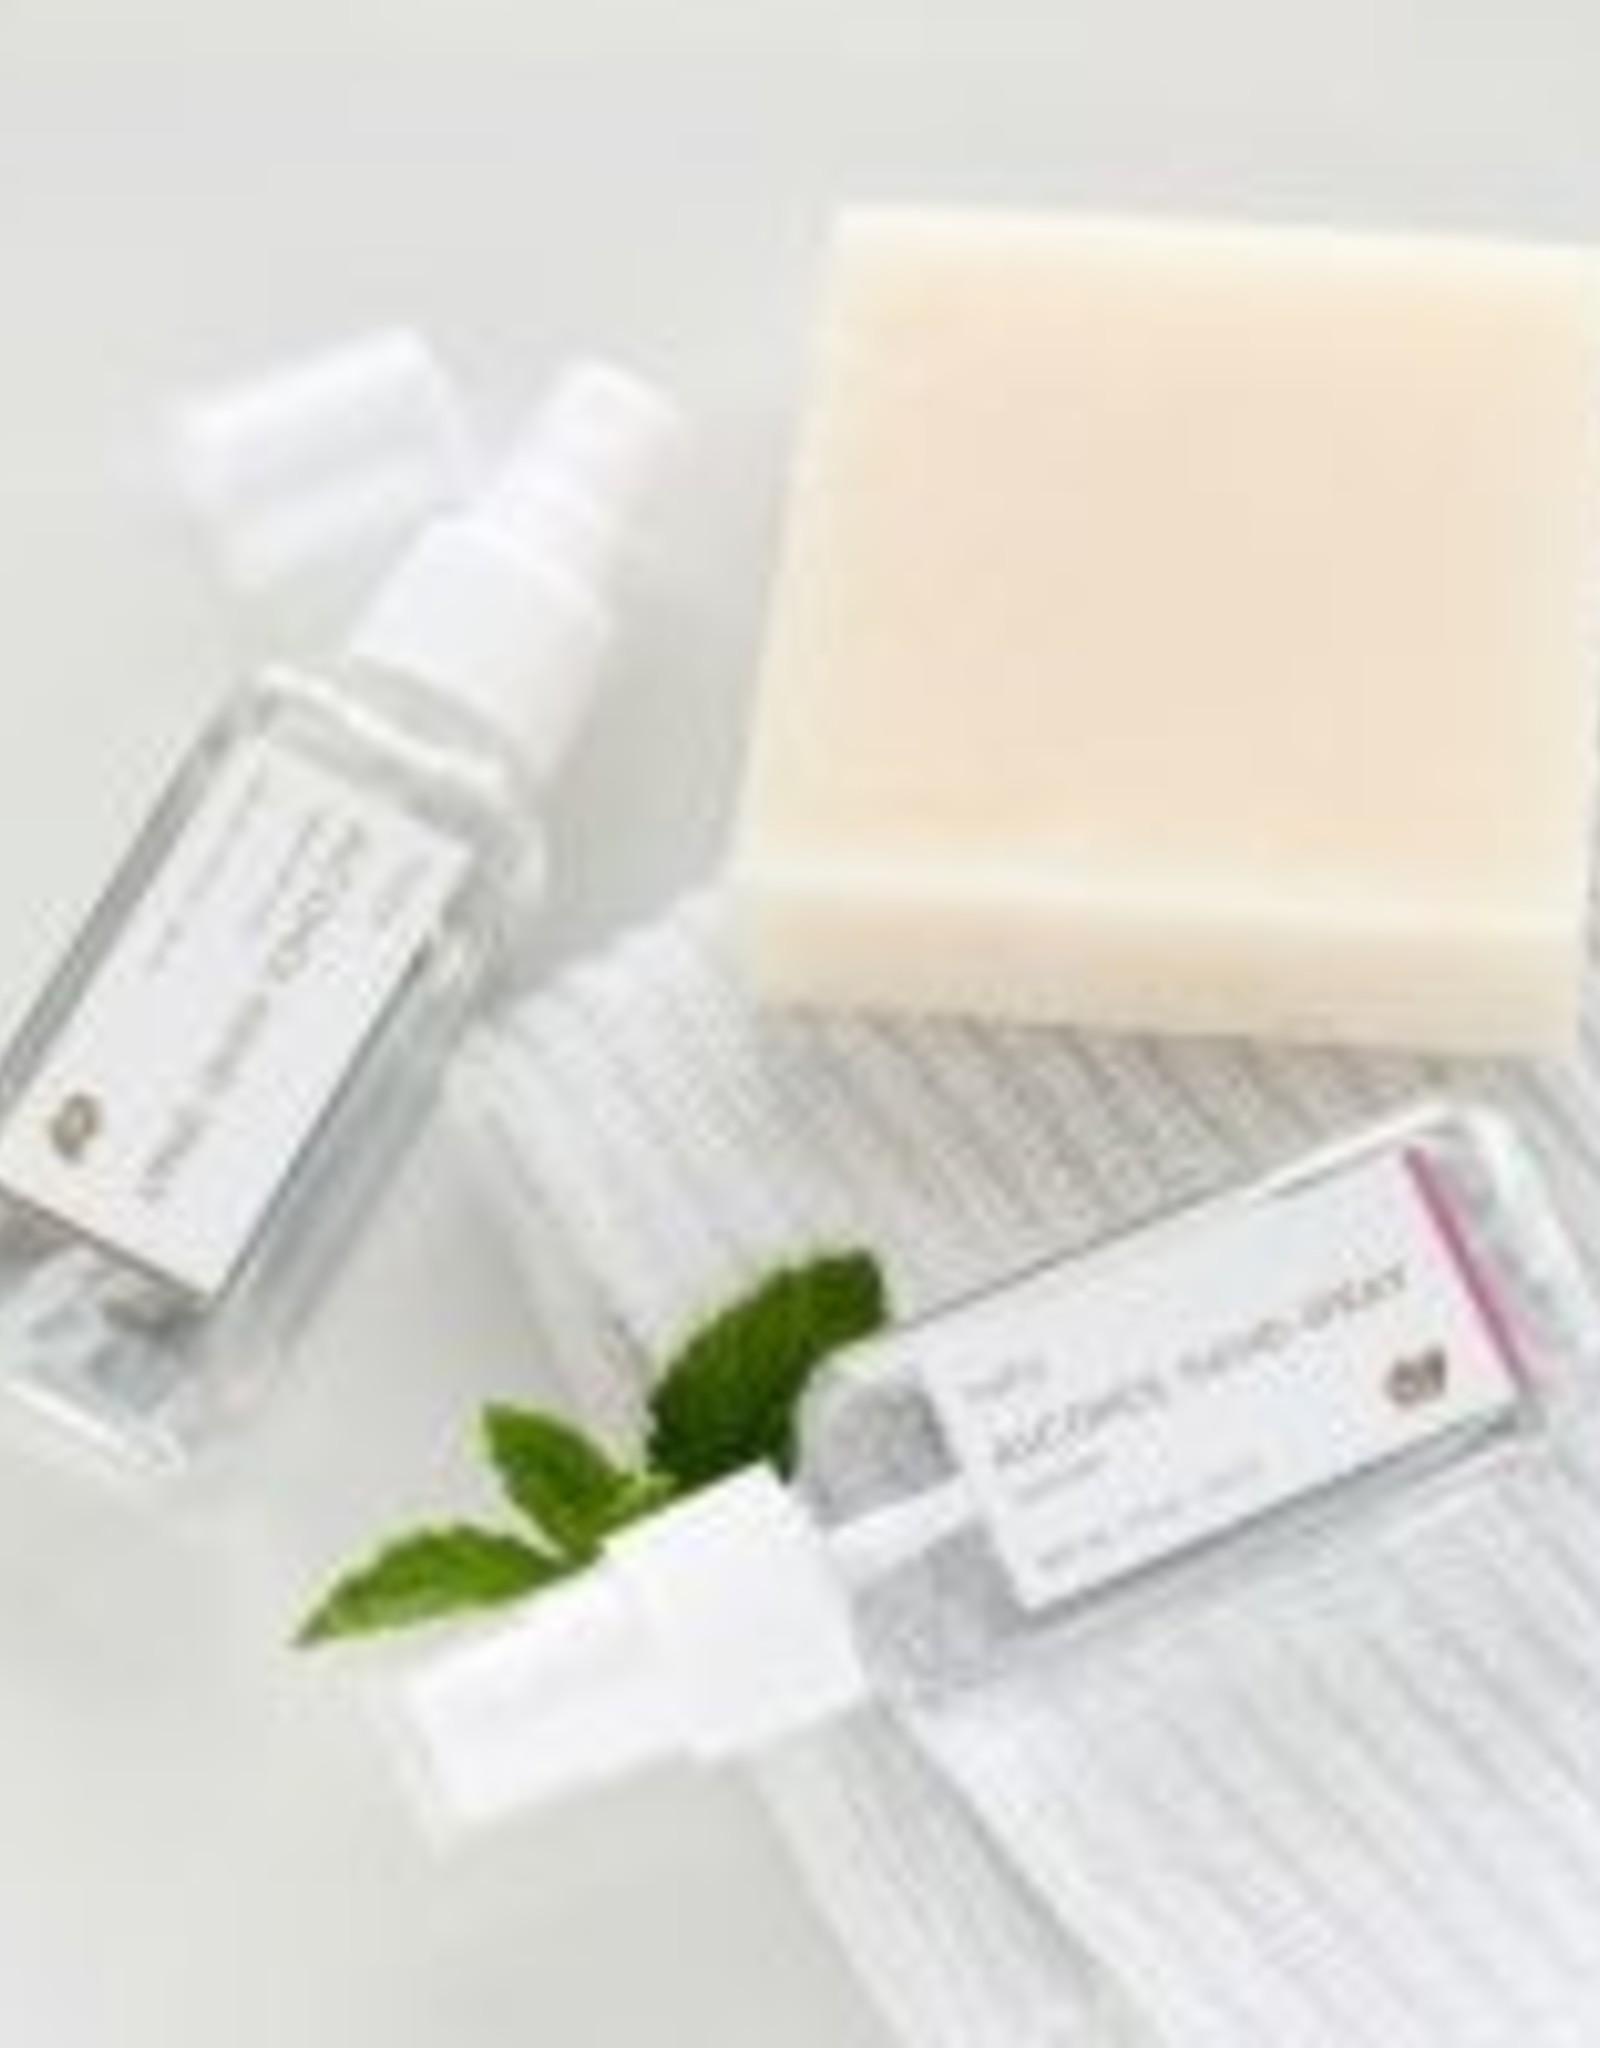 Lavender Hand Sanitizer Spray (2oz)